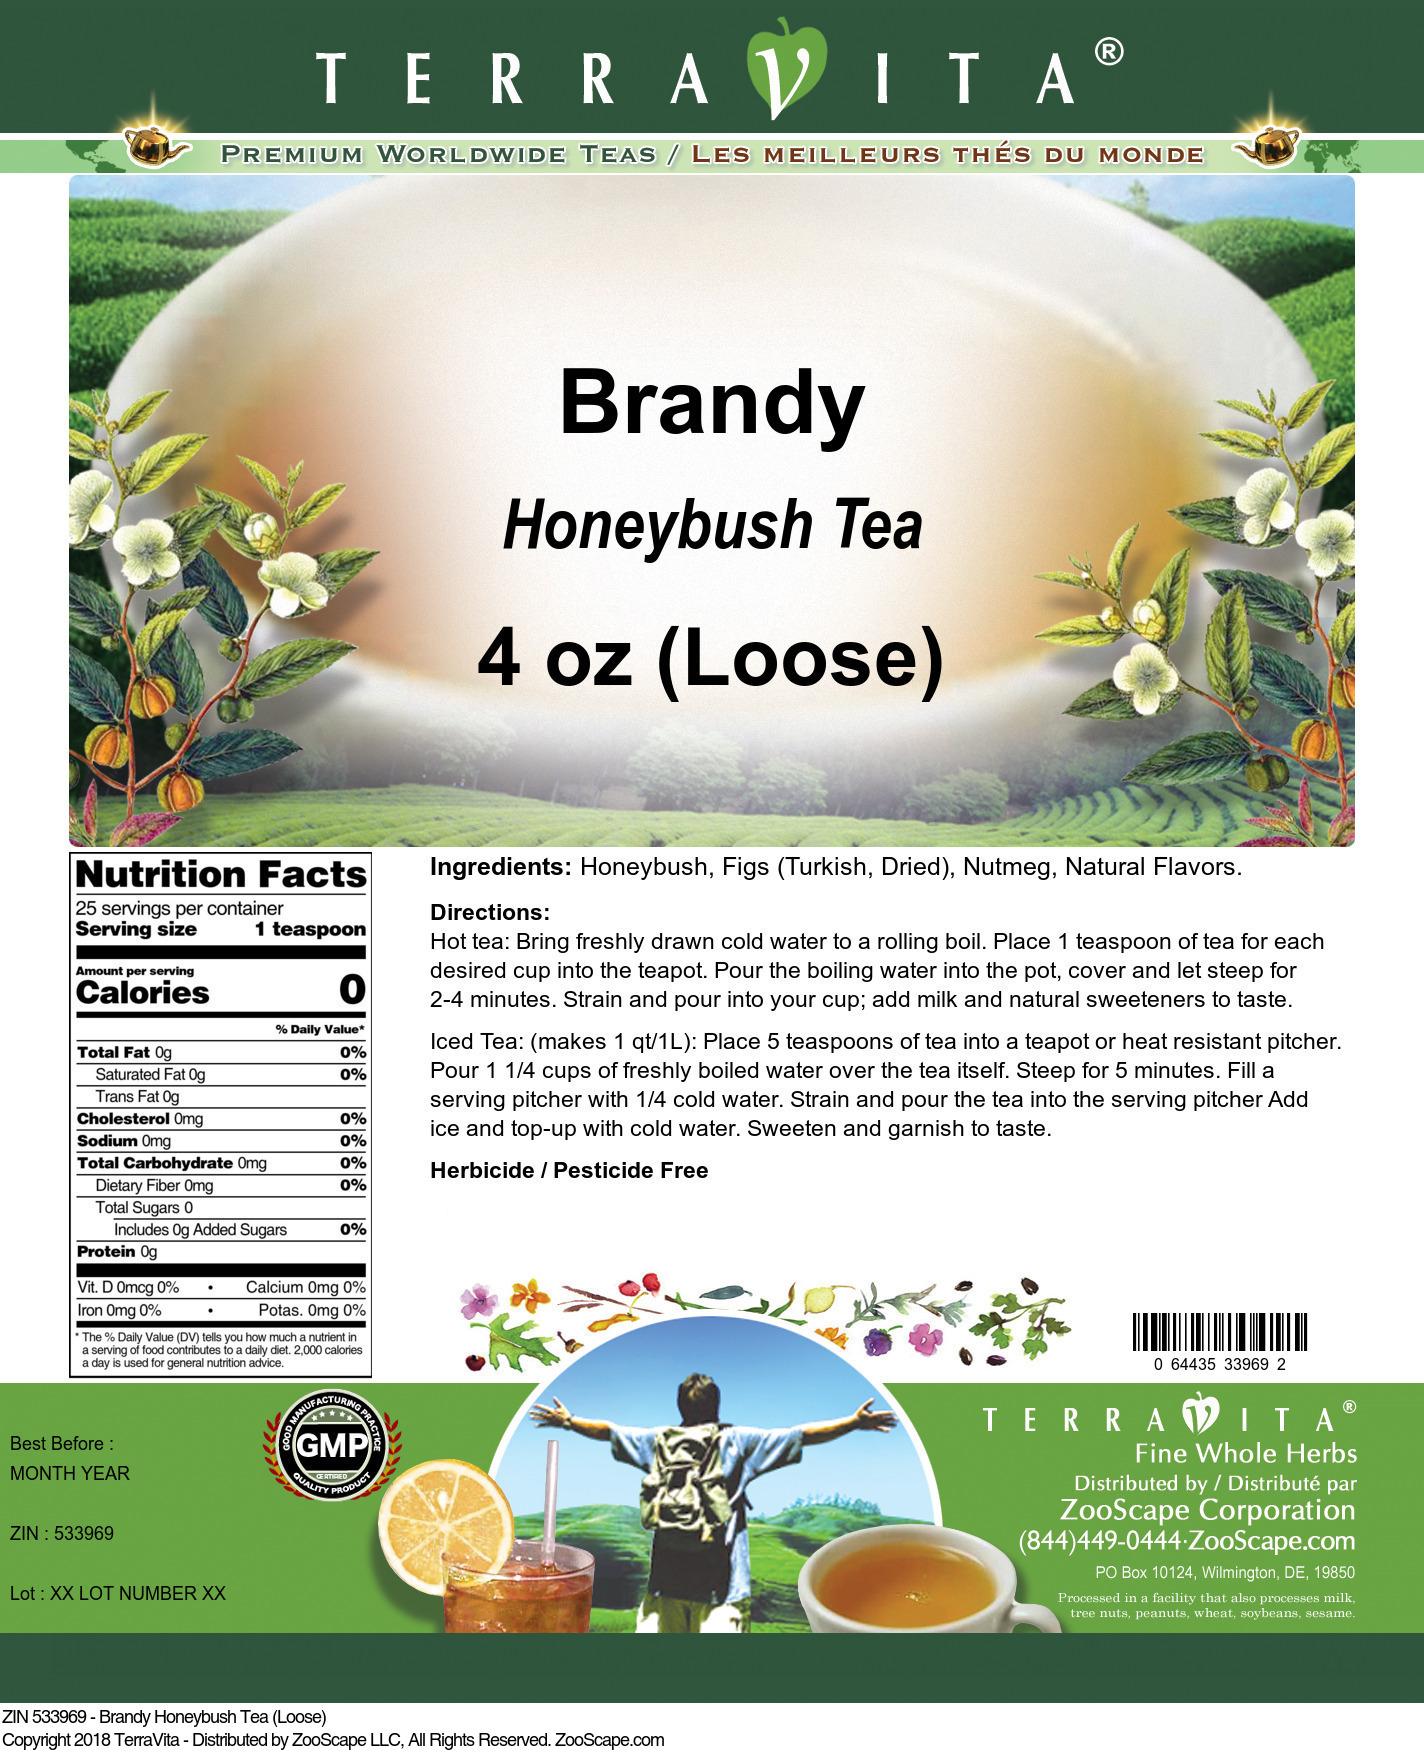 Brandy Honeybush Tea (Loose)